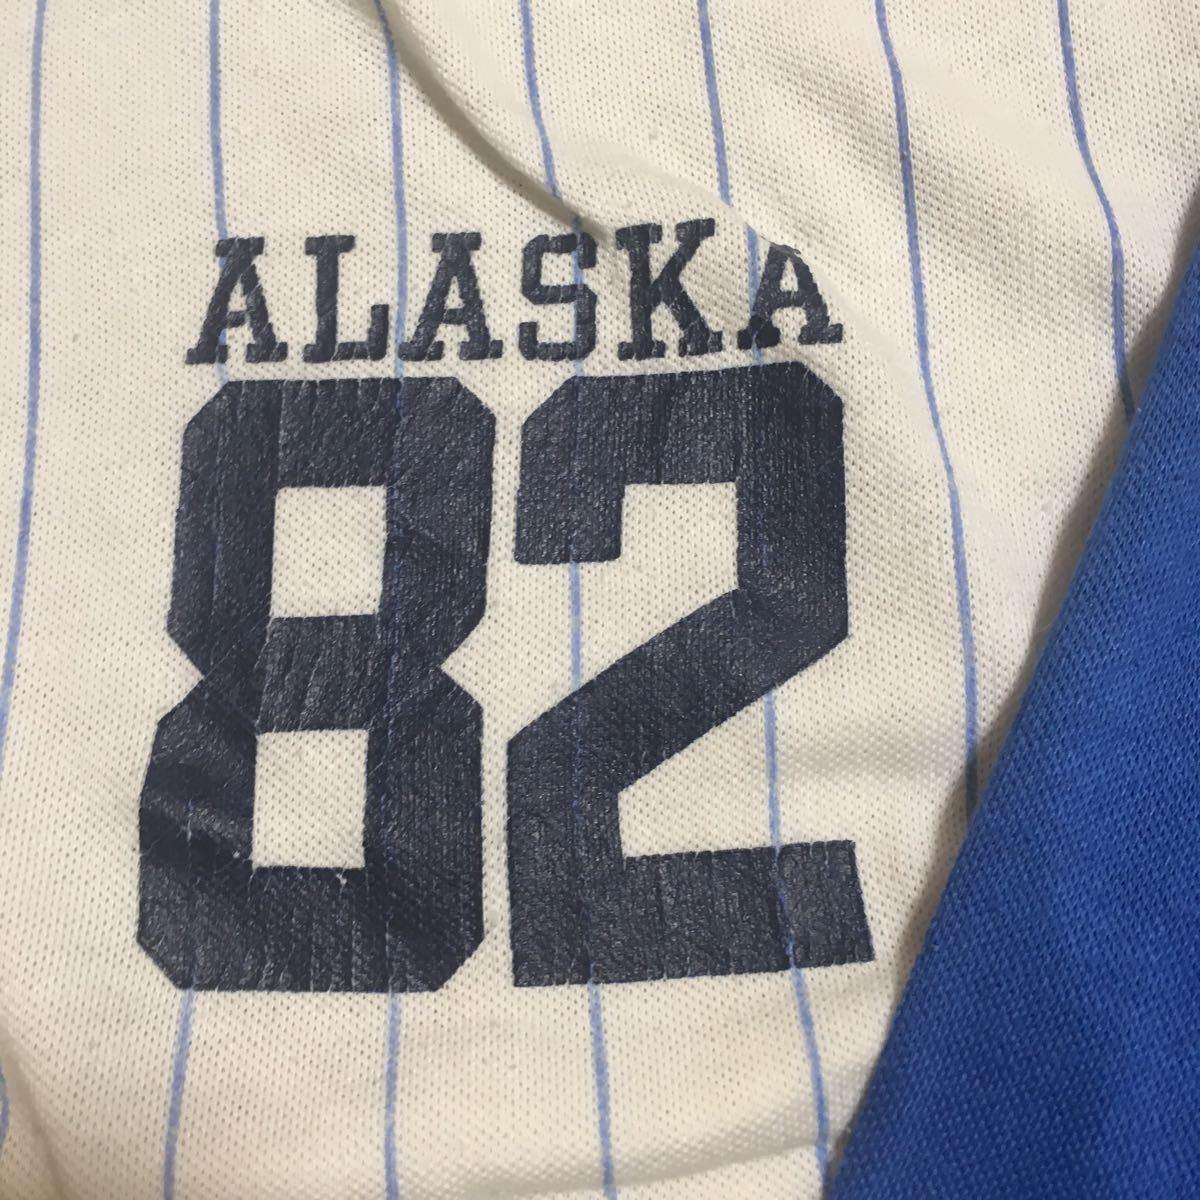 80s USA製 ARTEX ヘンリーネックシャツ 七分袖 青 白 ストライプ サイズ不明 実寸XLサイズ 古着 ヴィンテージ ナンバリング ベースボール_画像3